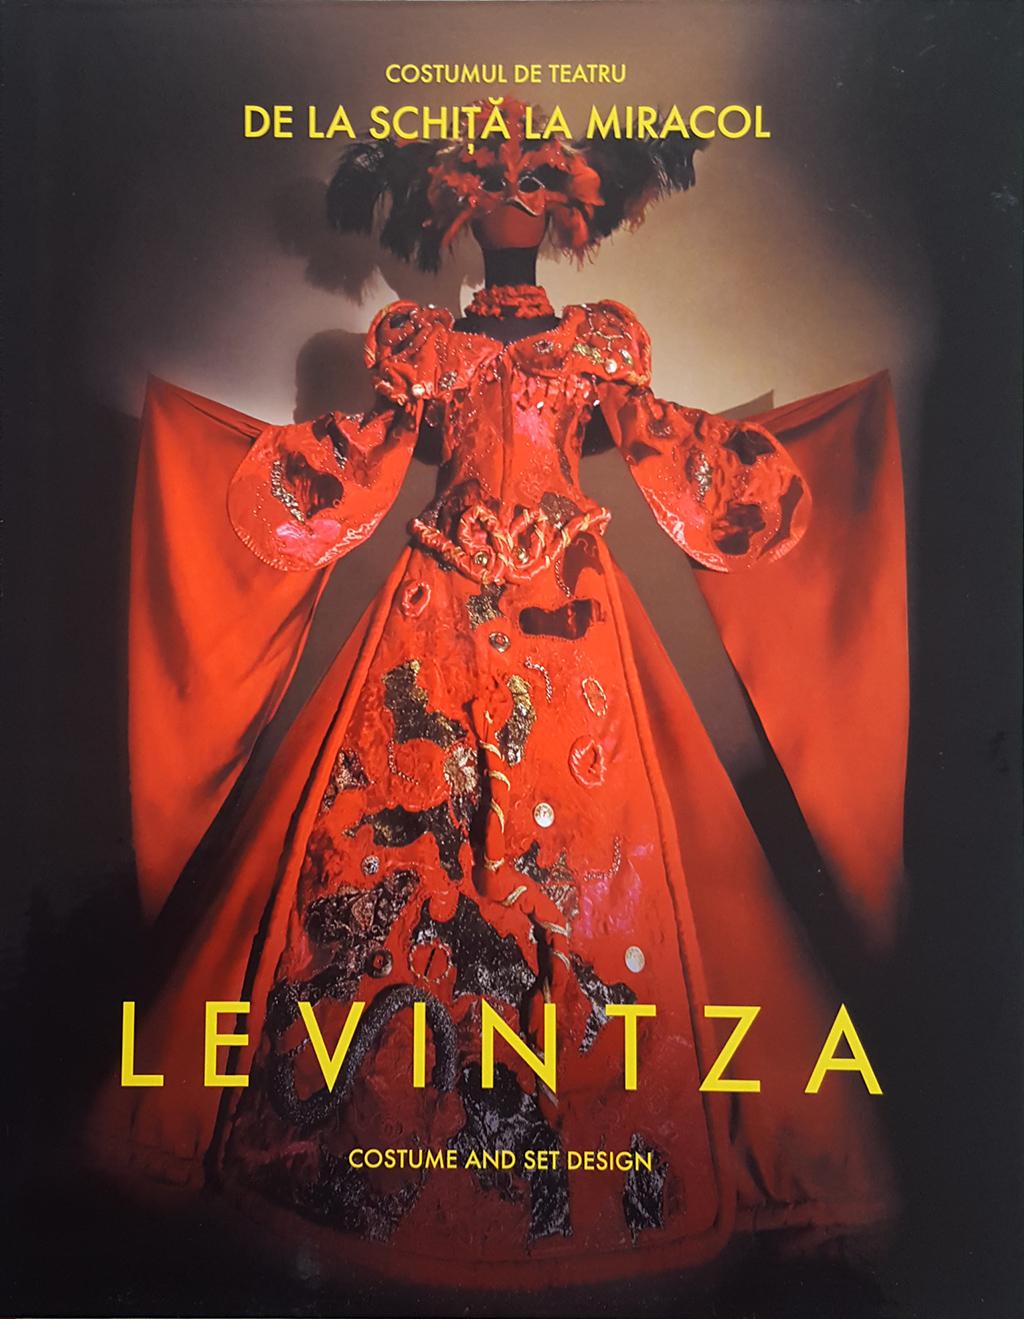 Costumul De Teatru - De La Schita La Miracol